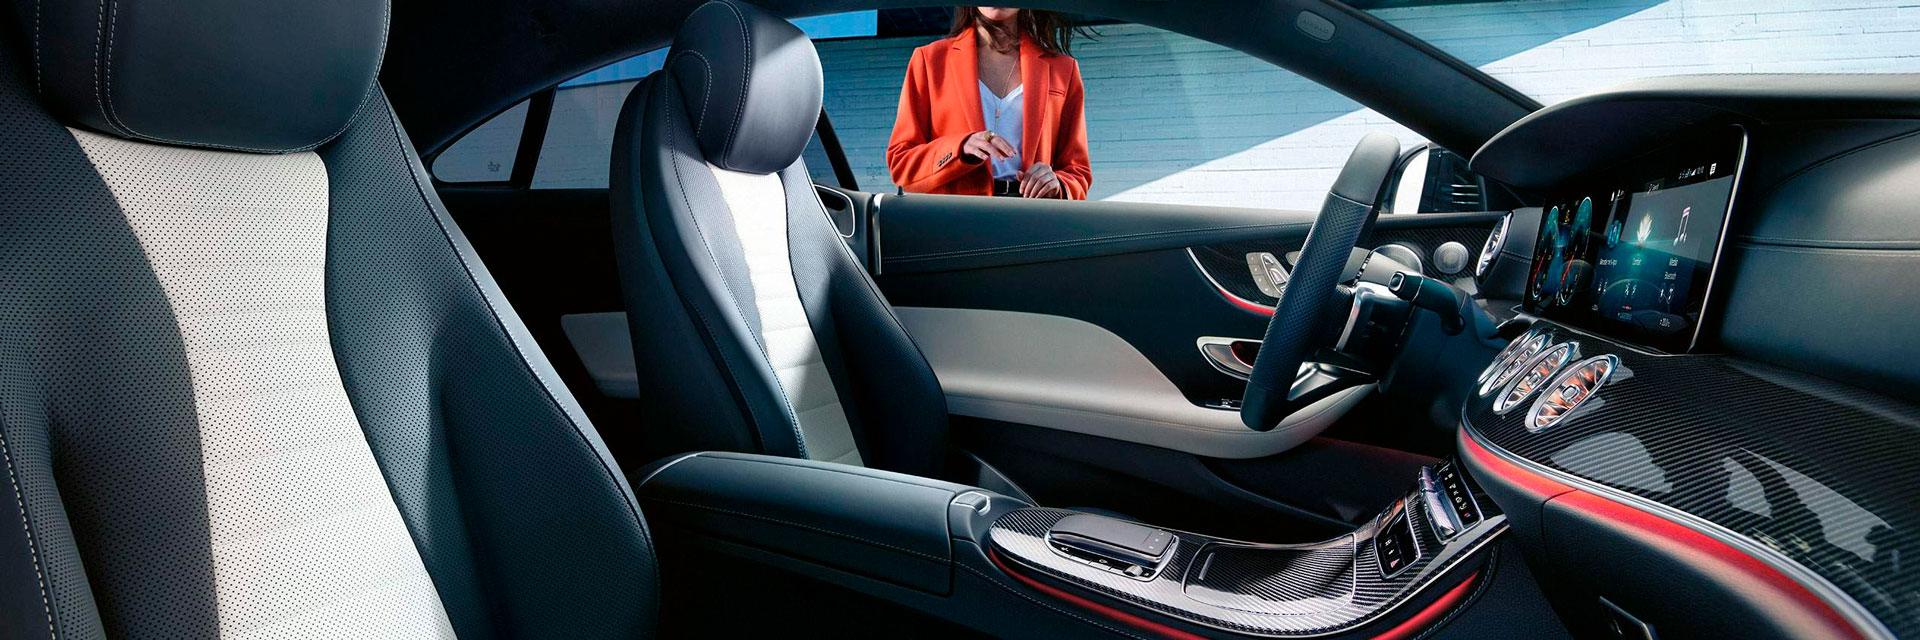 БезопасностьMercedes-Benz E-Class